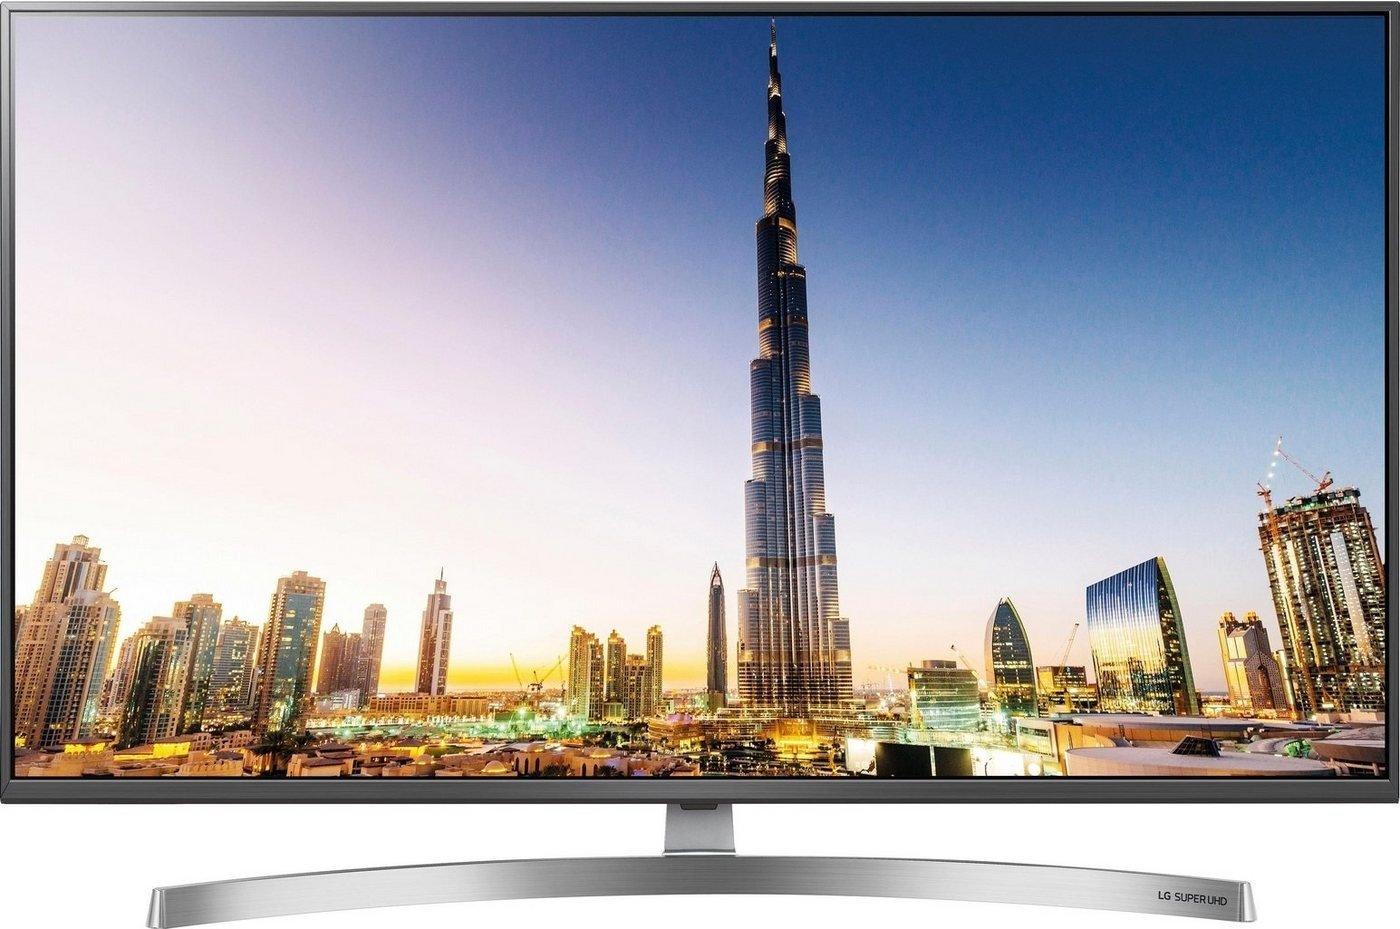 LG 49SK8100LLA 123 cm (49 Zoll) Smart-TV (Super UHD, Triple Tuner, 4K Cinema HDR, Dolby Vision, DLNA, WLAN) für 619,99€ (Amazon)